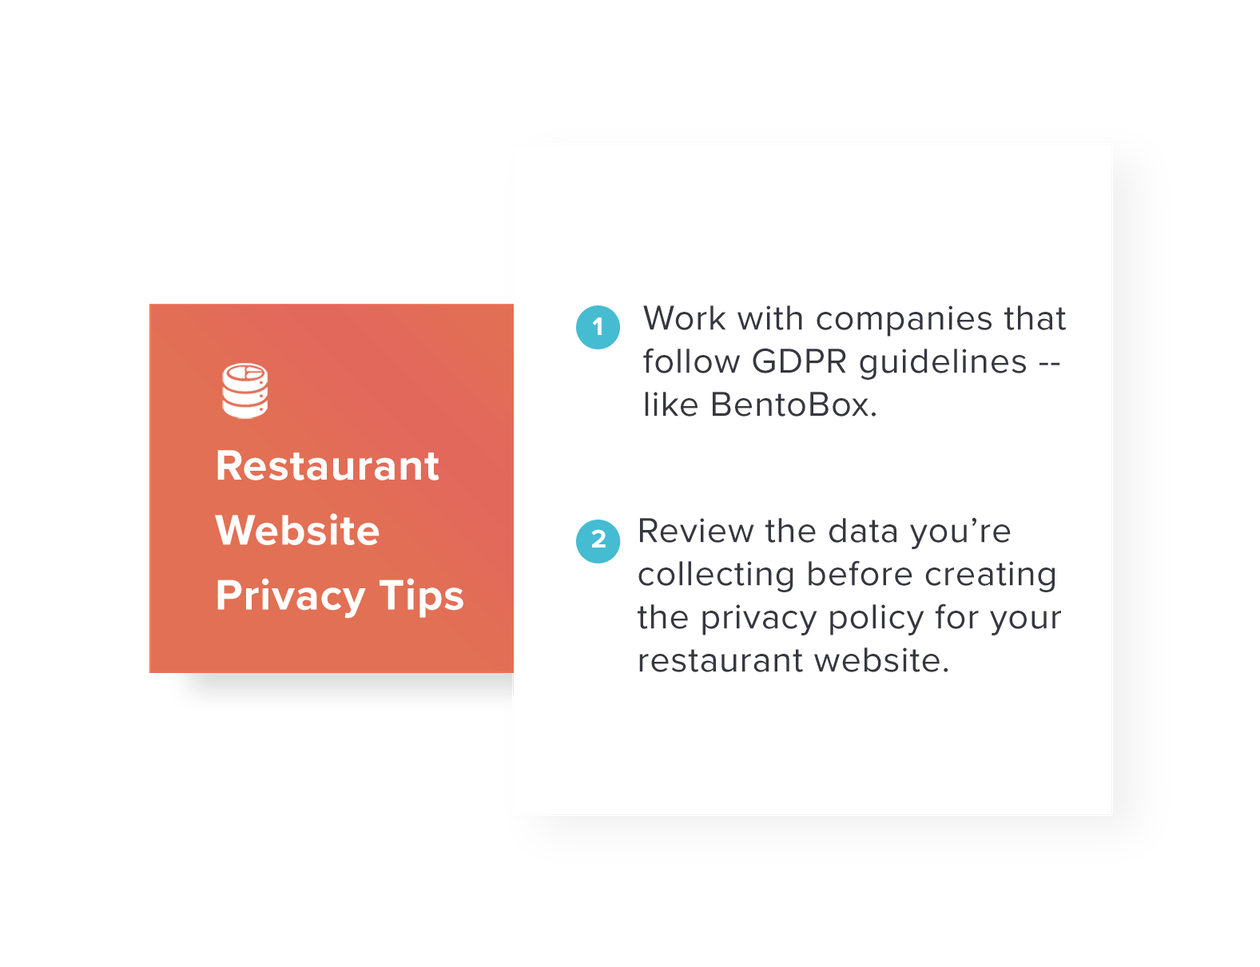 Restaurant Website Privacy Tips